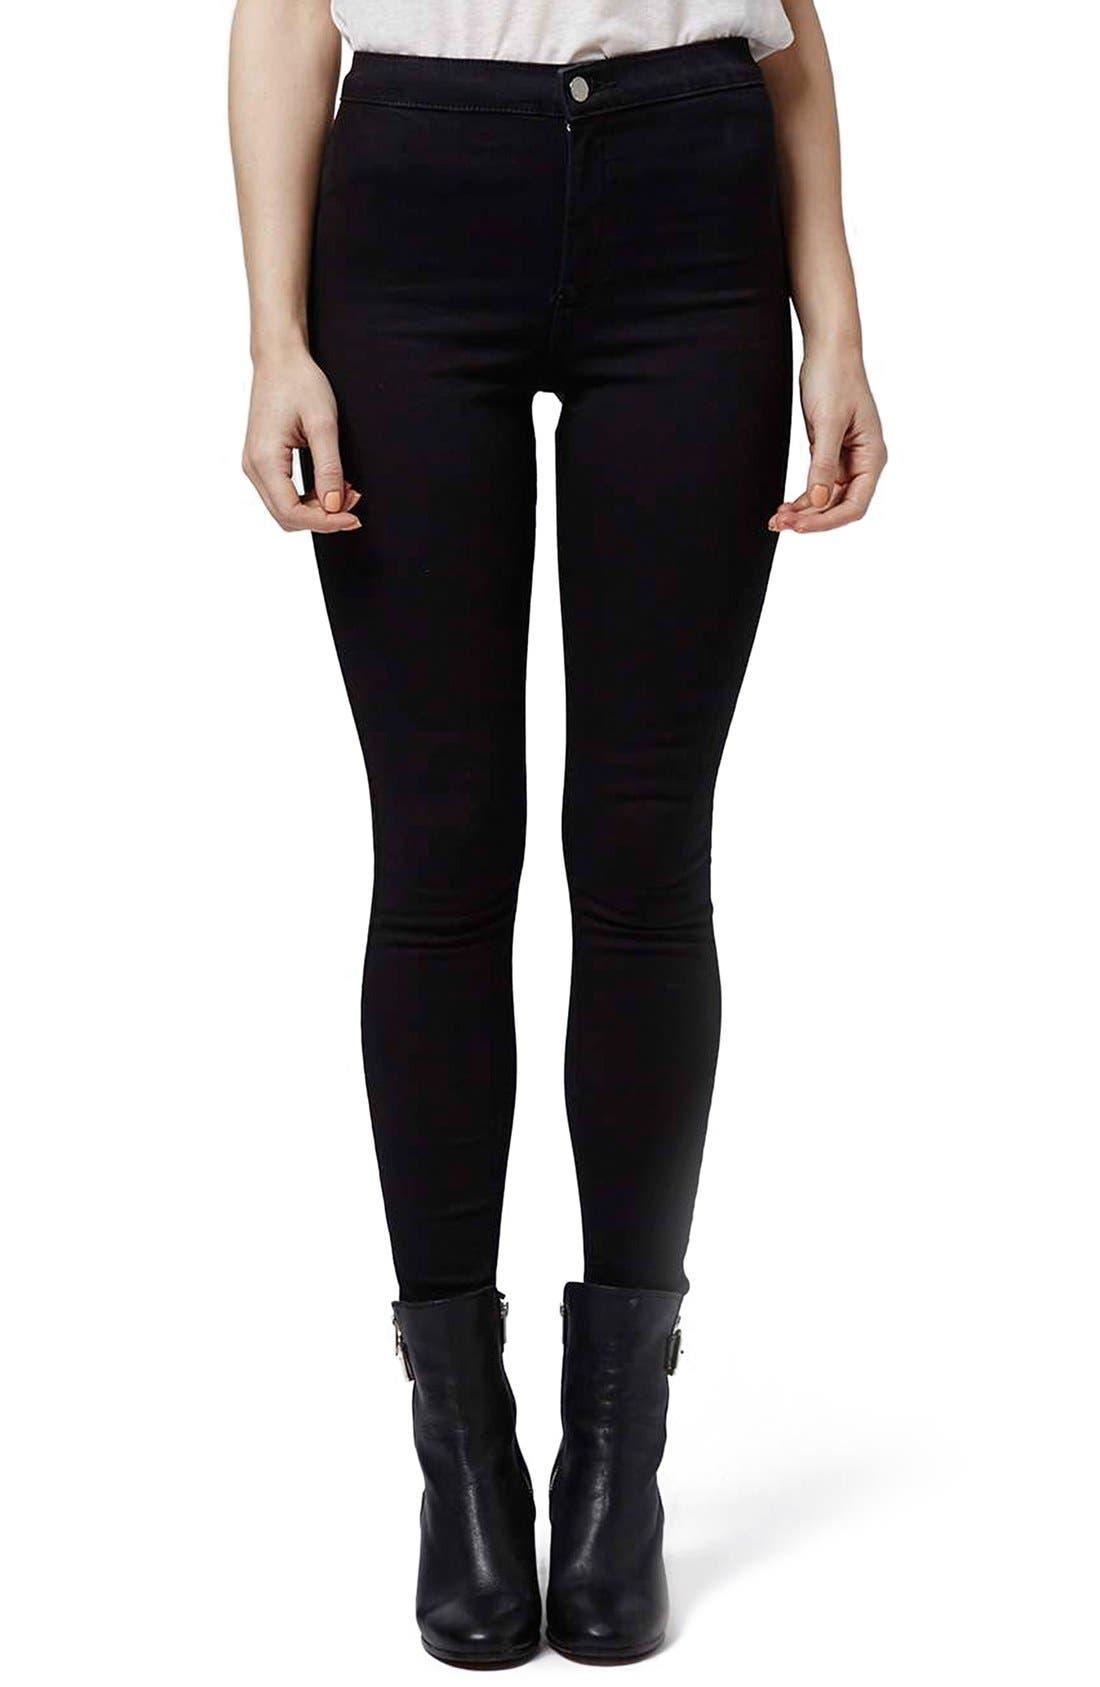 Alternate Image 1 Selected - Topshop 'Joni' High Rise Skinny Jeans (Petite)